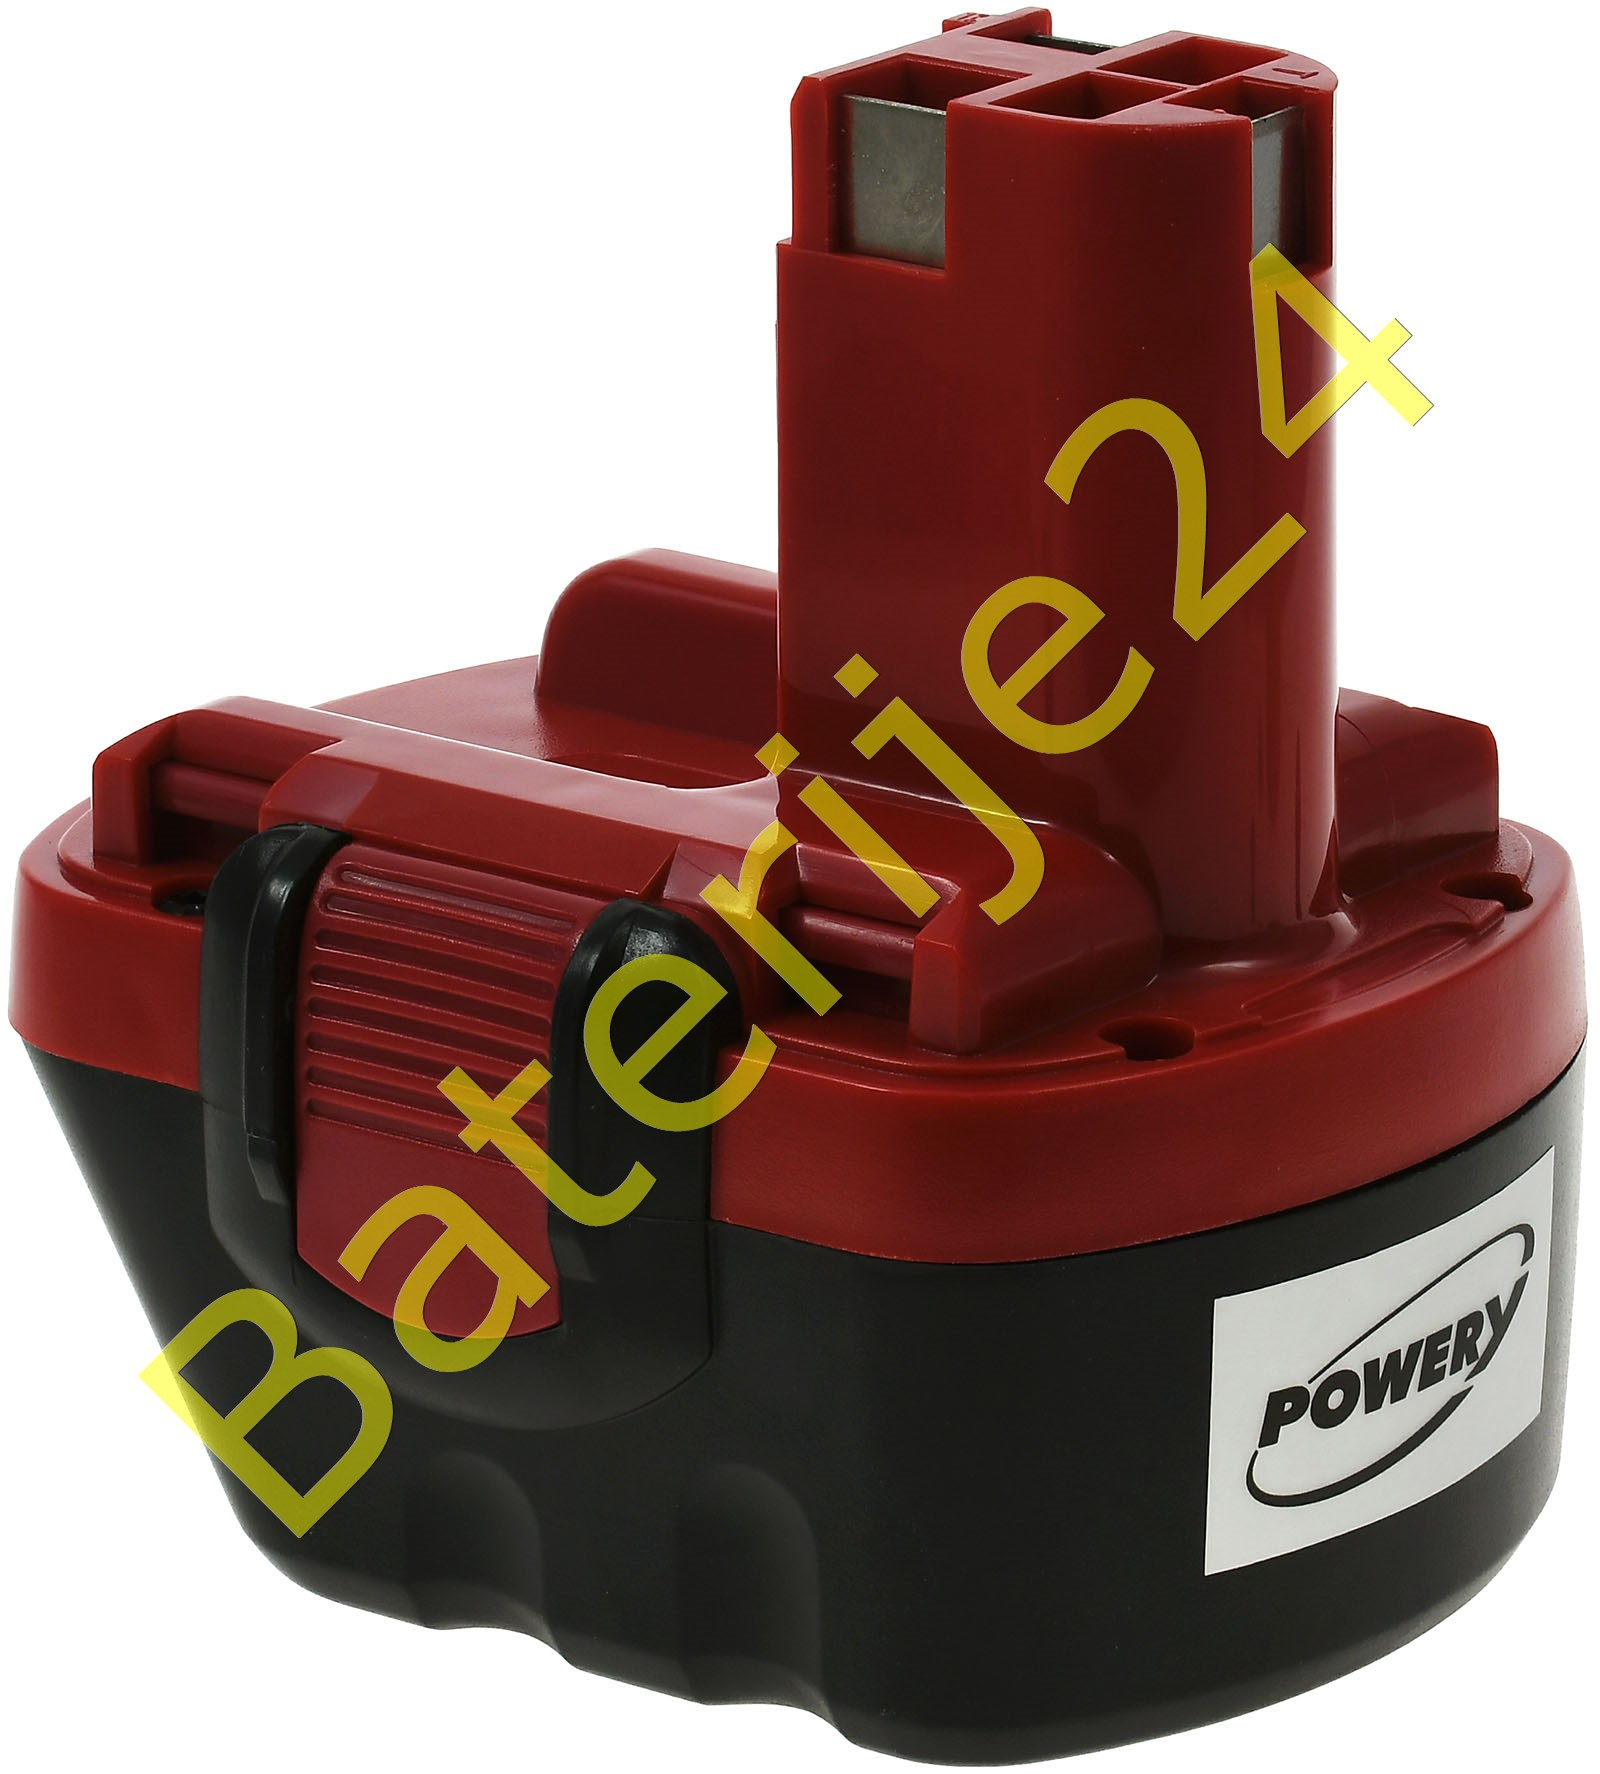 Baterija za alat Bosch O-Pack 12,0V 2000mAh NiCd